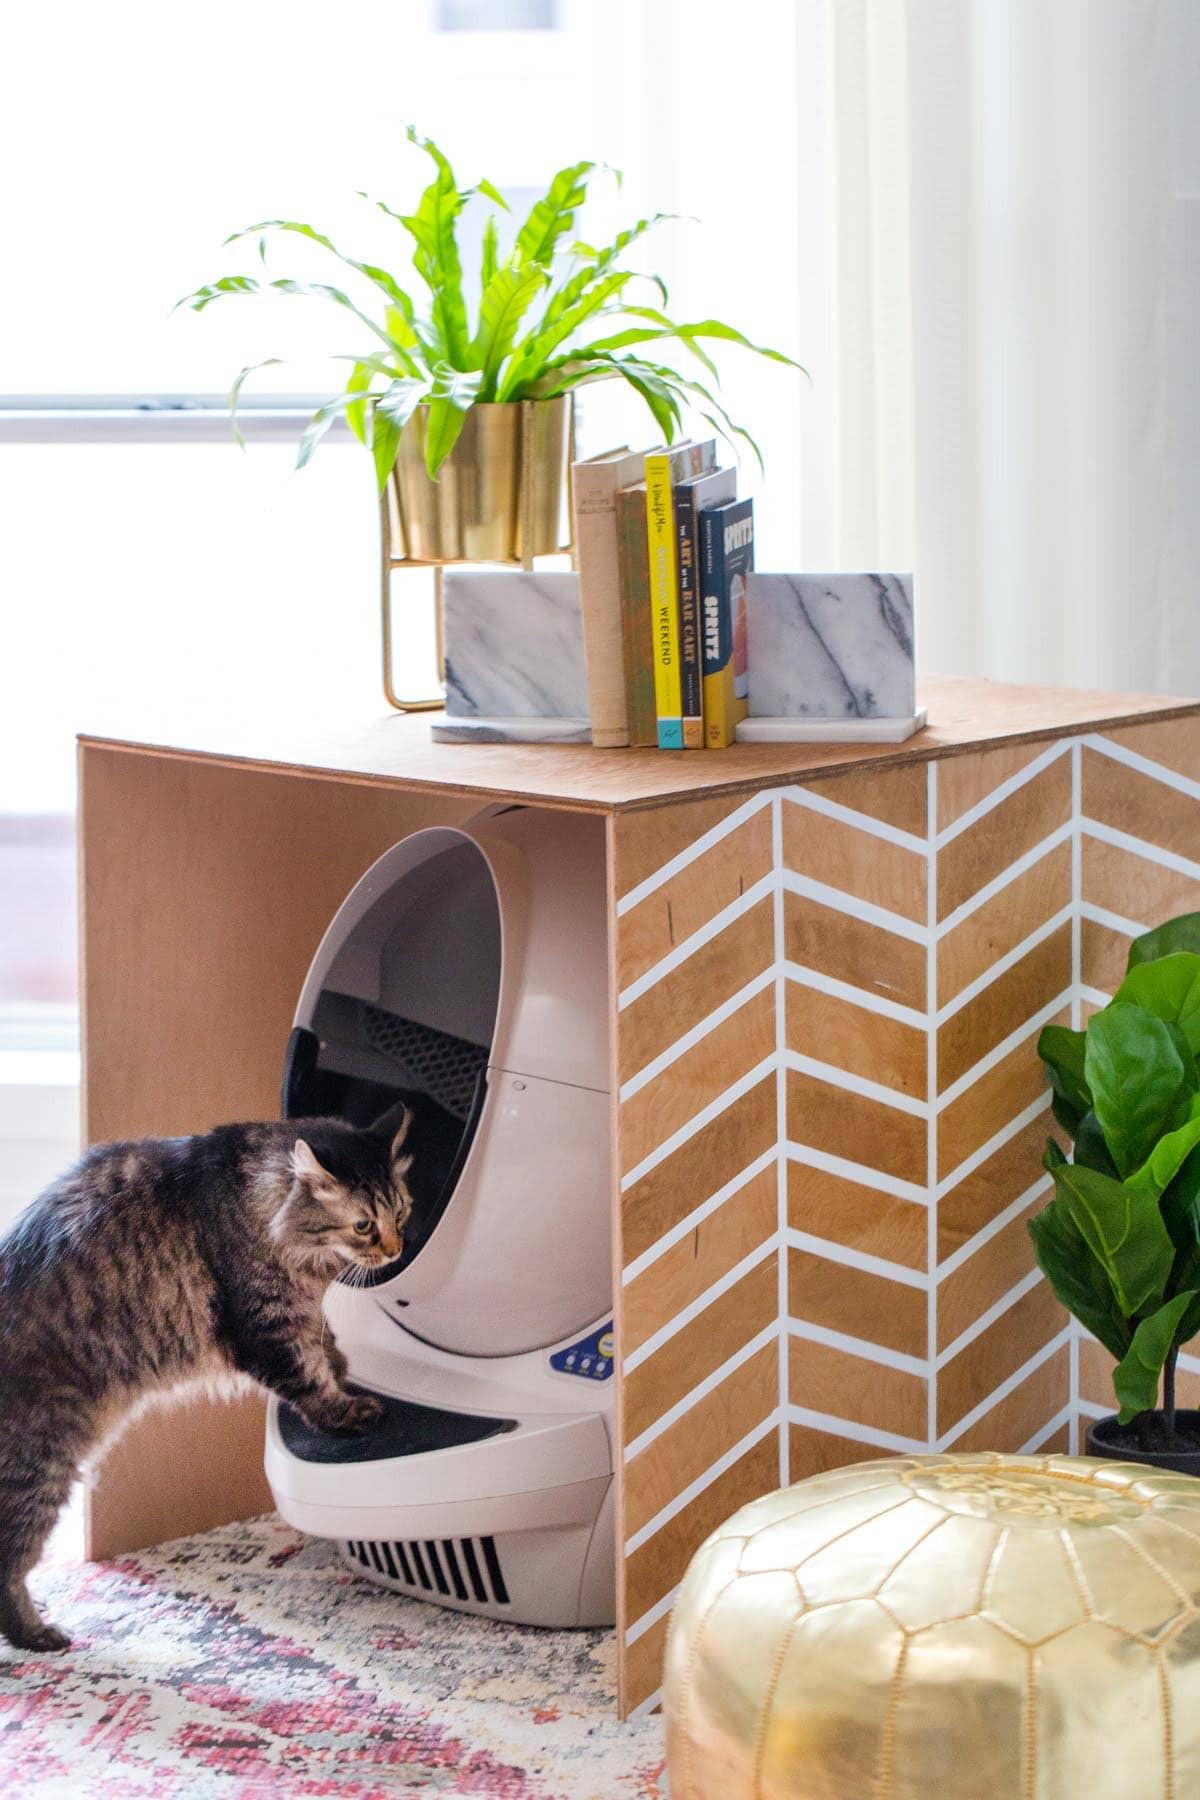 DIY Cat Litter Box Cover  Patterned DIY Litter Box Cover Sugar & Cloth DIY Home Decor